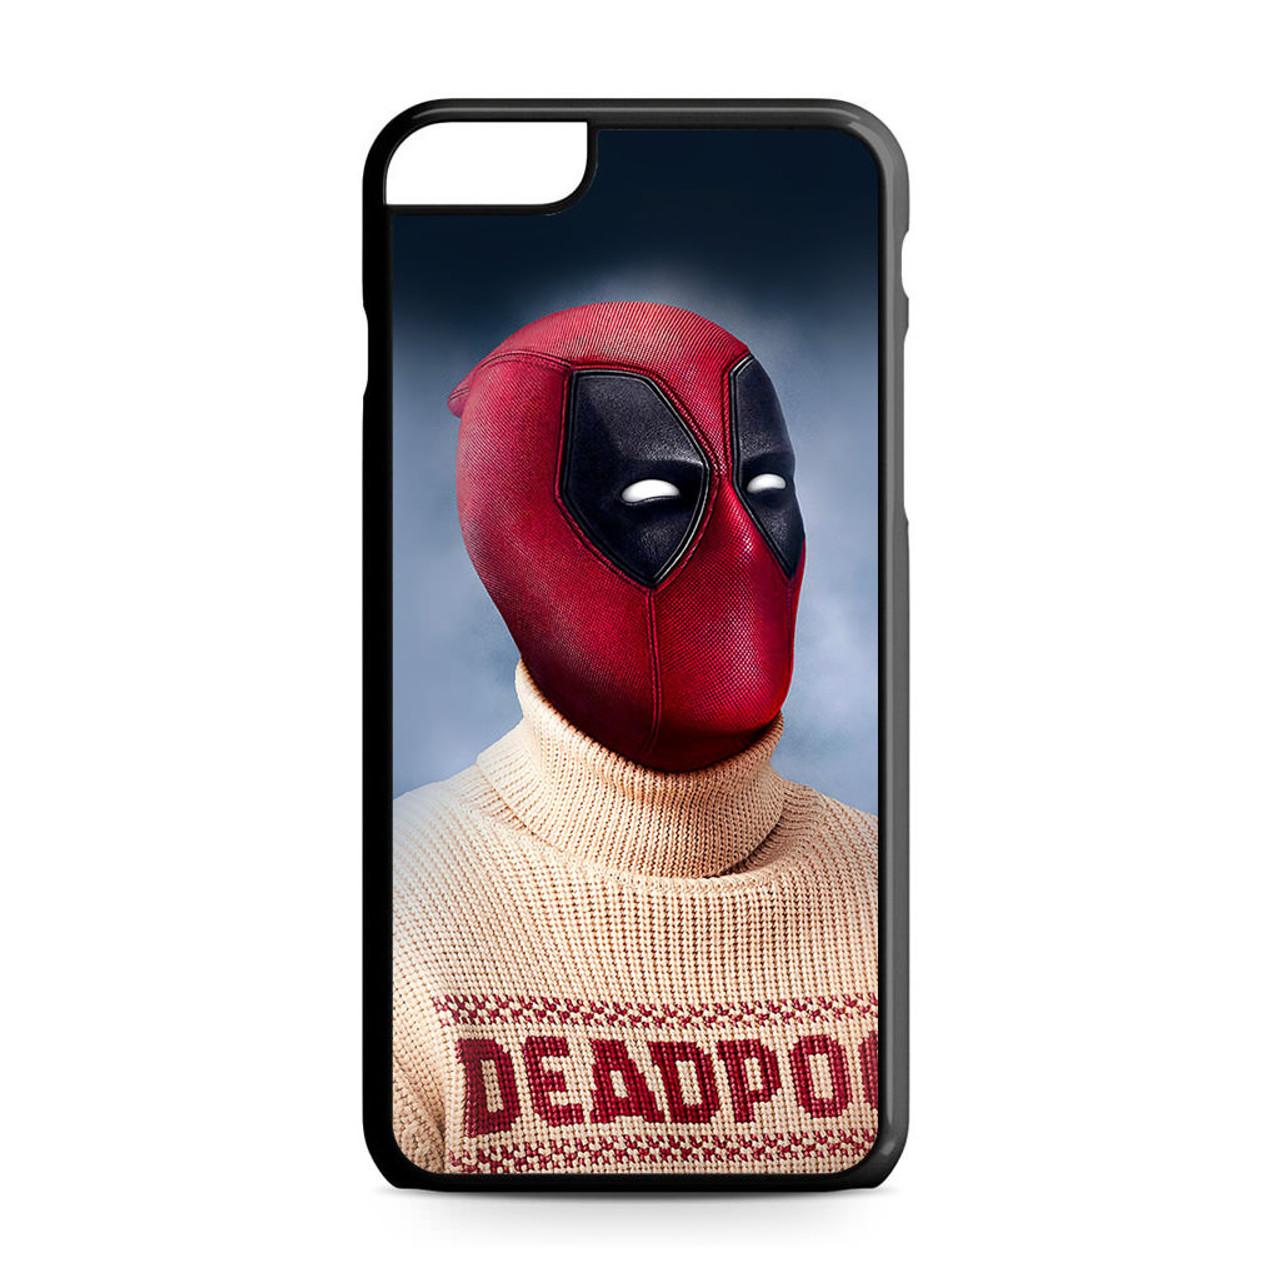 Deadpool Sweater iPhone 6 Plus/6S Plus Case